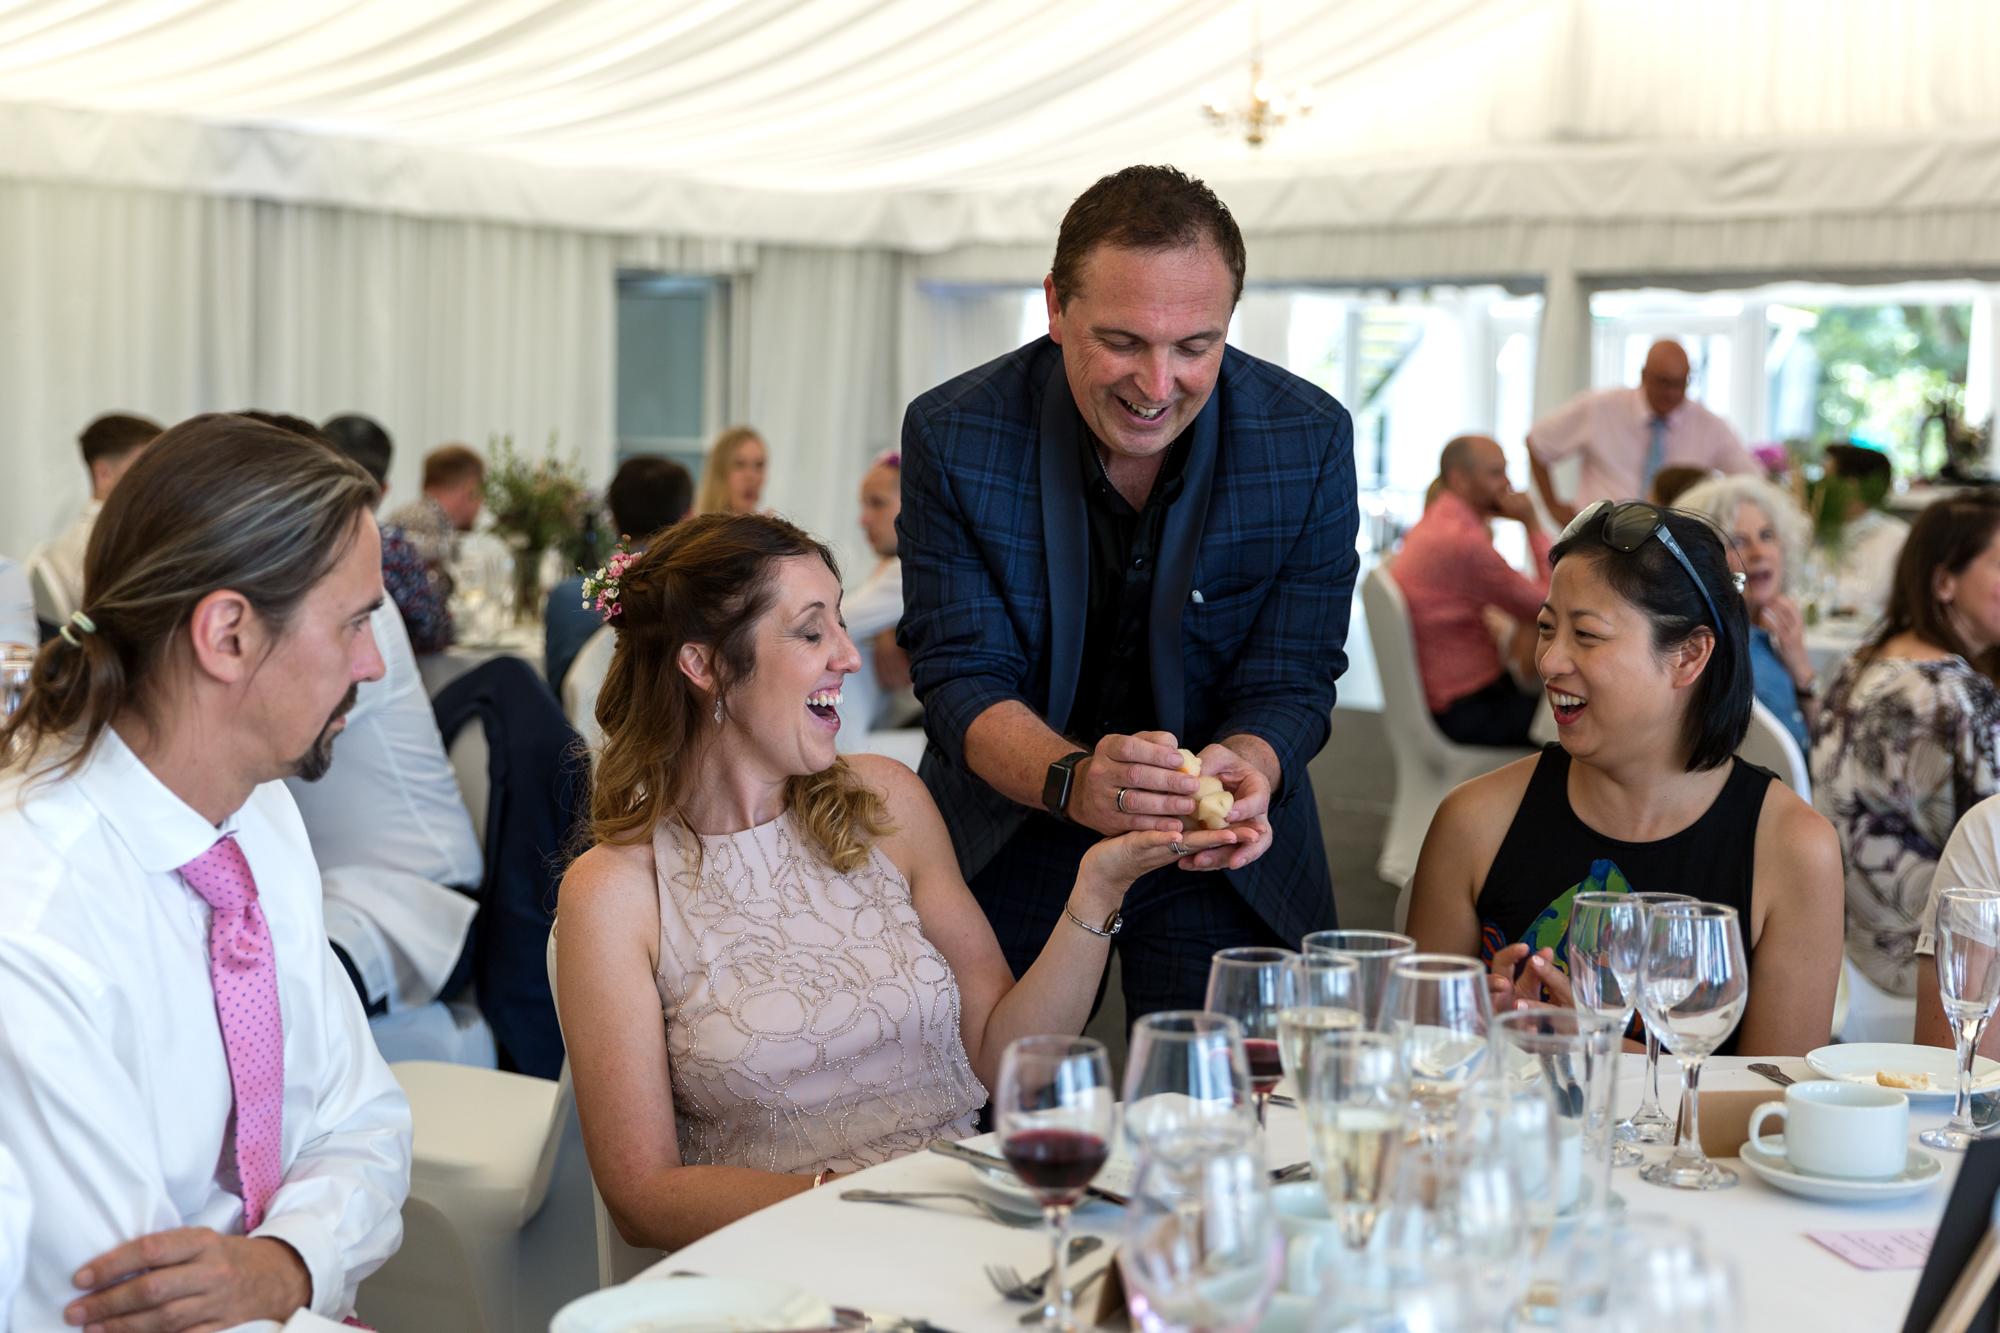 llechwen hall wedding photos